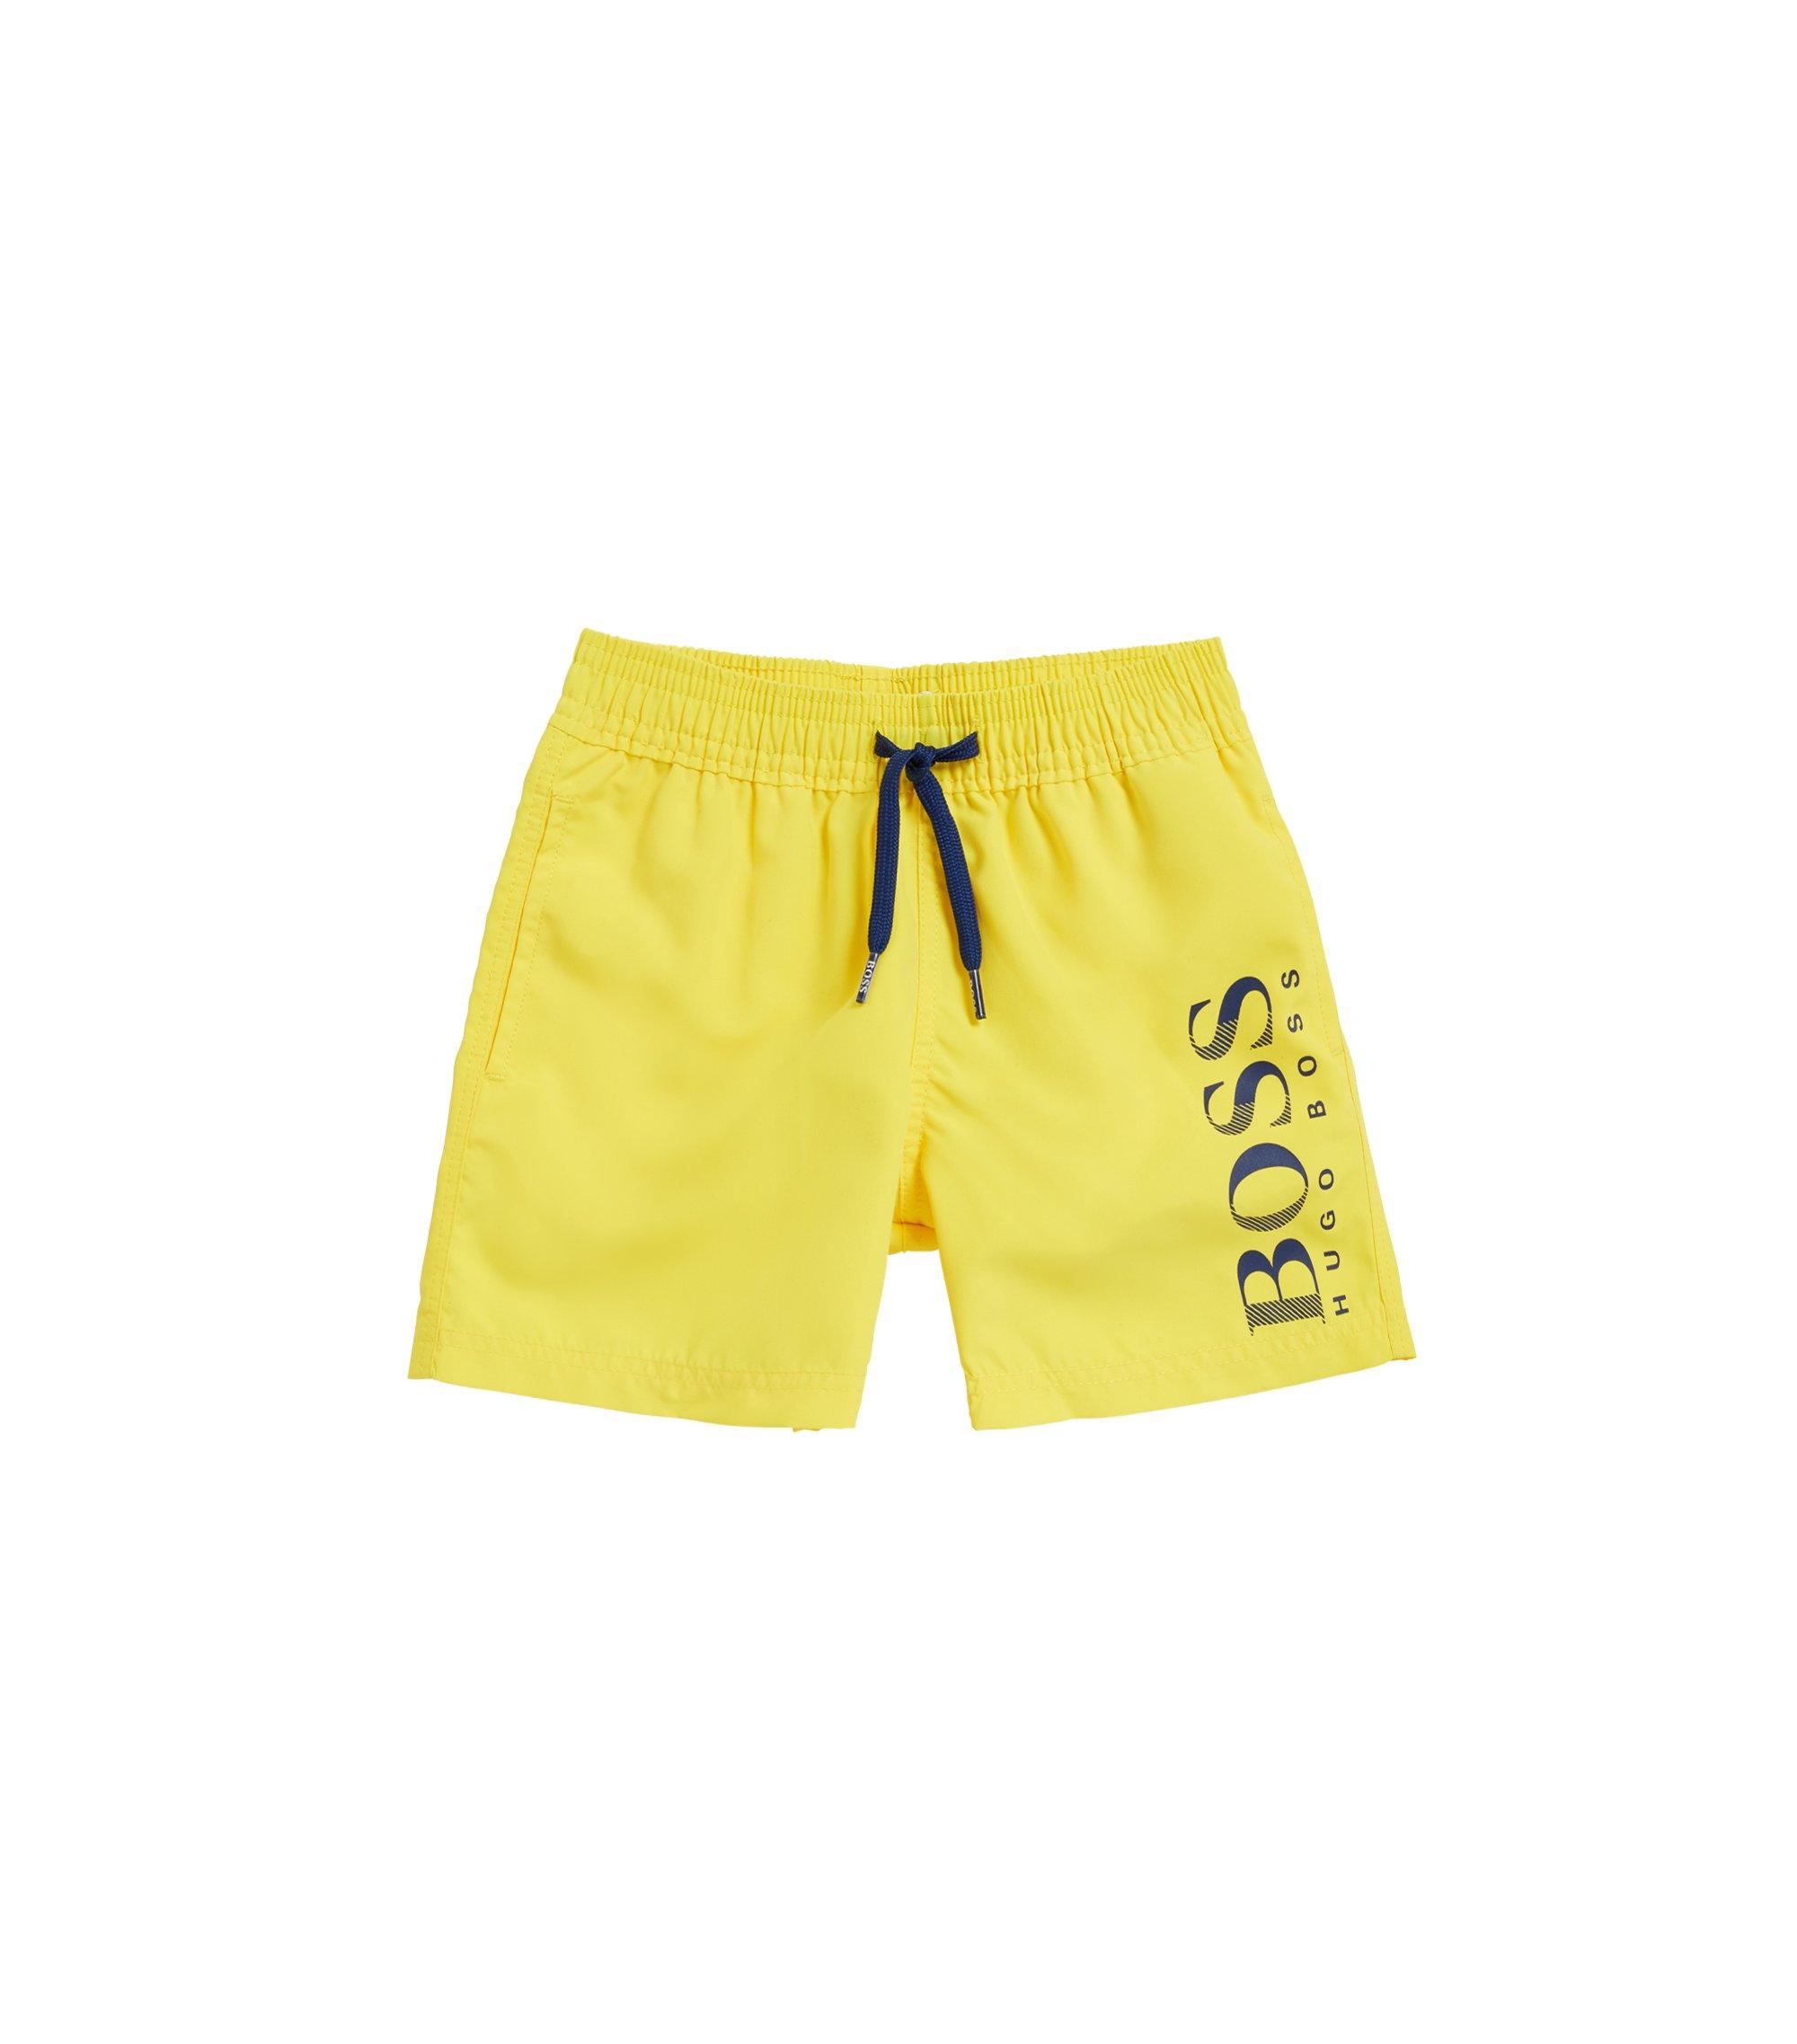 Kids' quick-dry swim shorts with logo print, Yellow